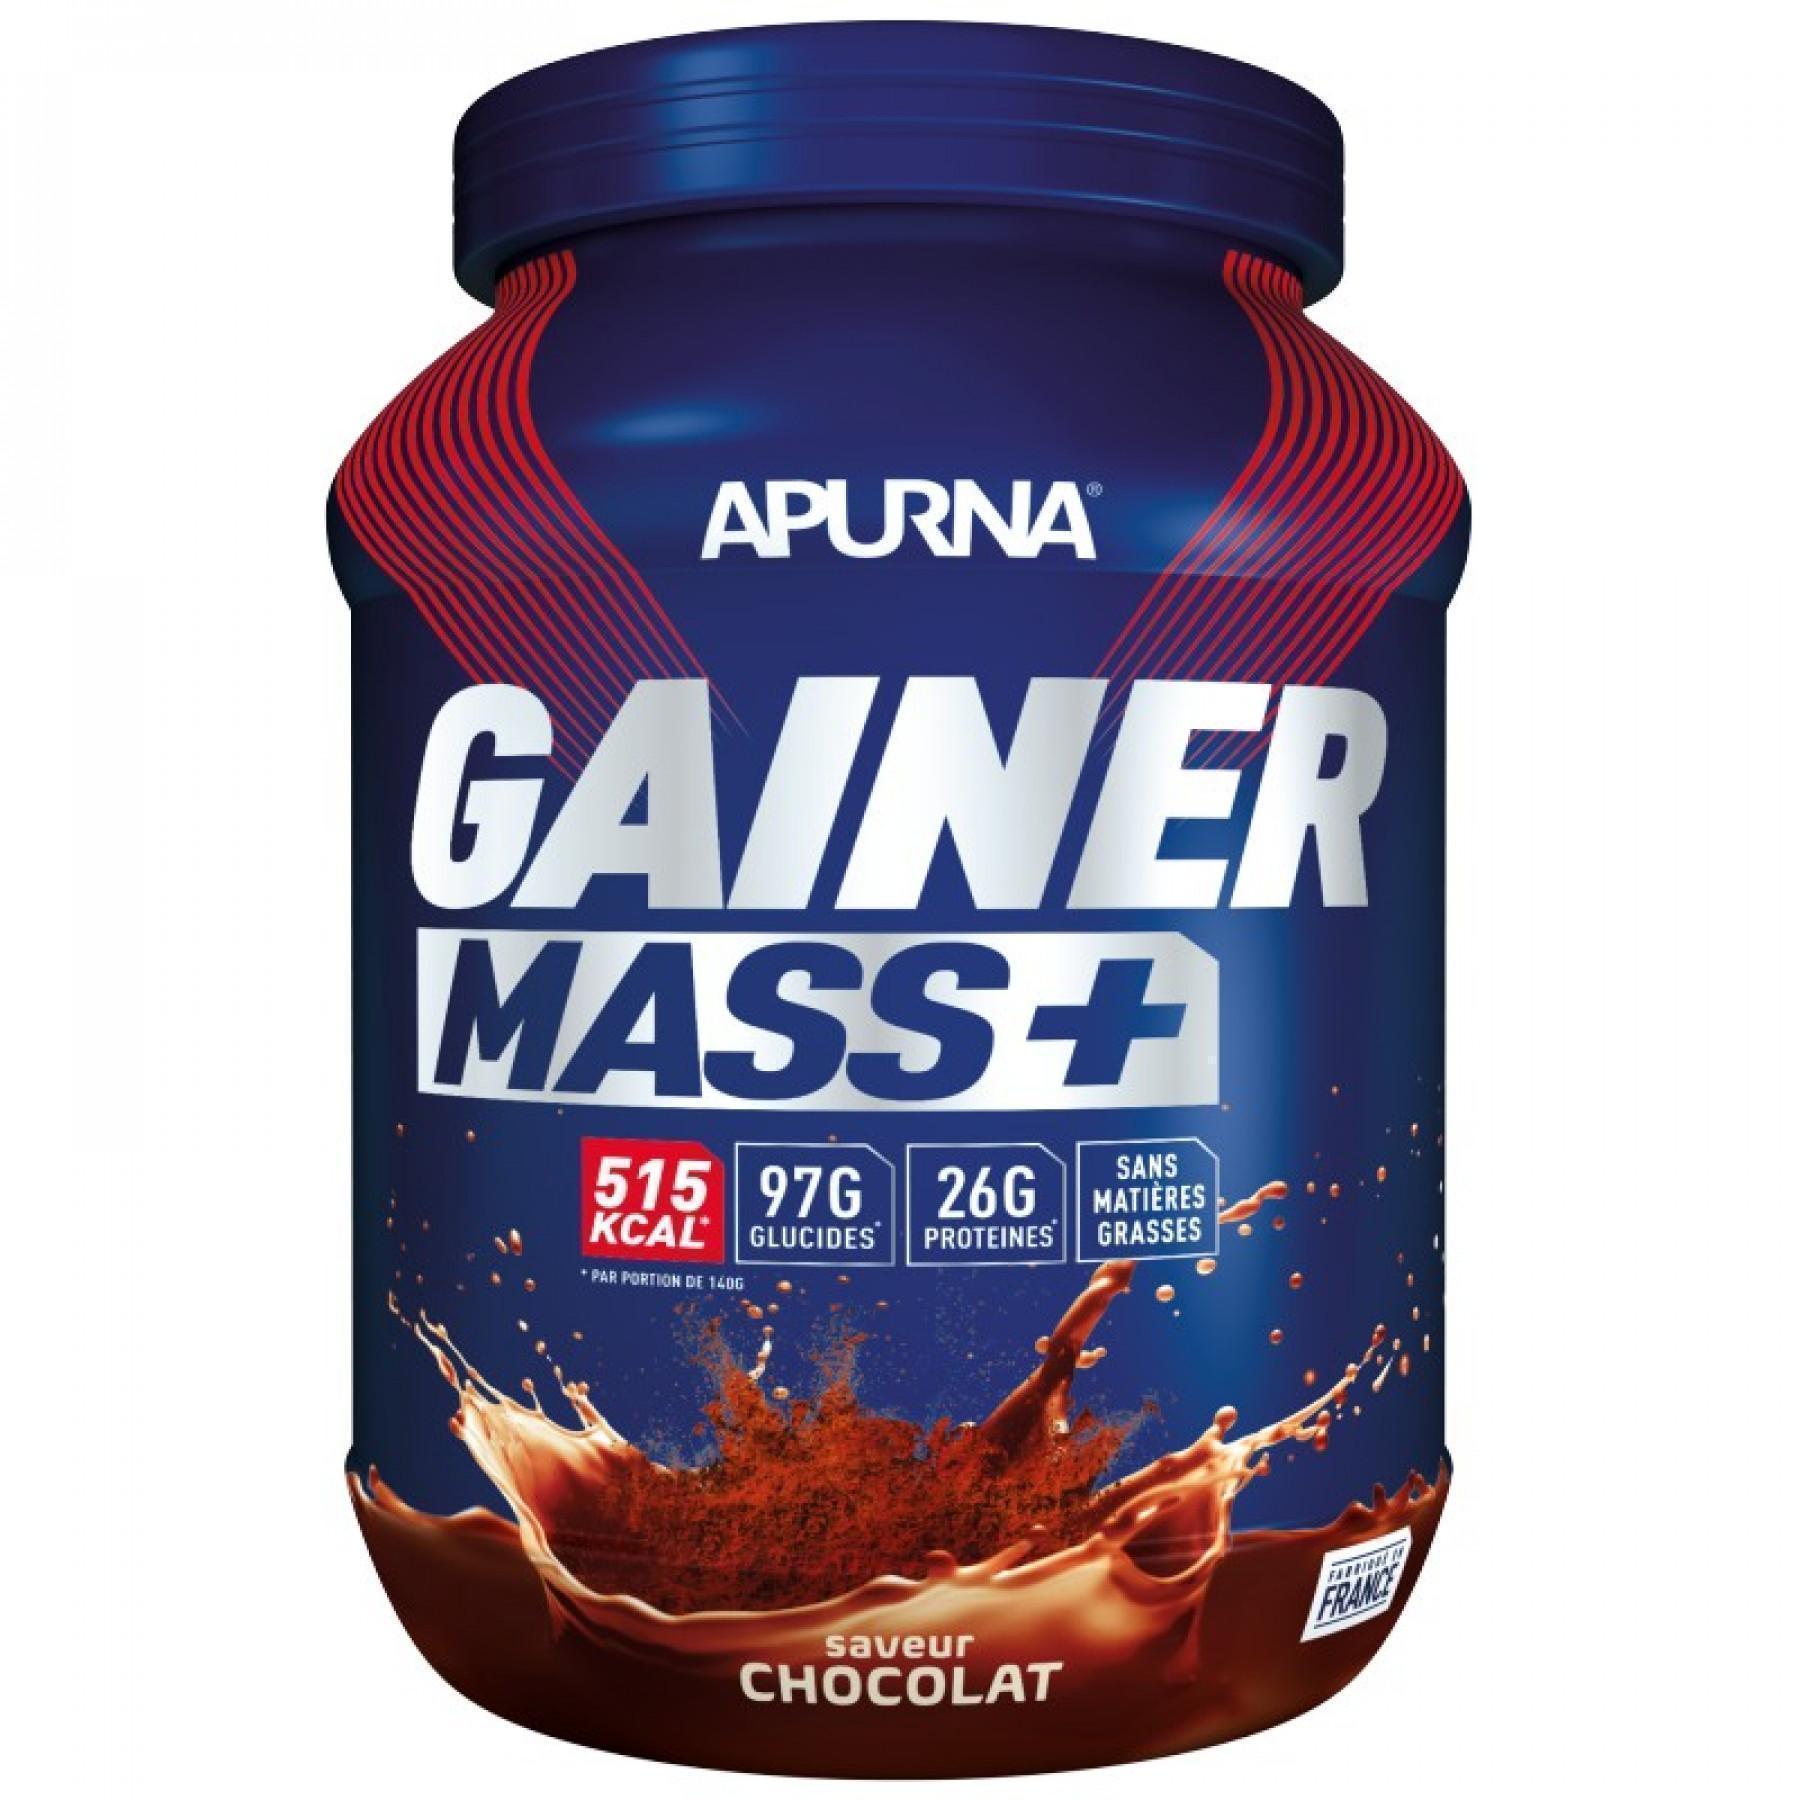 Pot Apurna Gainer Mass Plus - Chocolat - 1.1 Kg